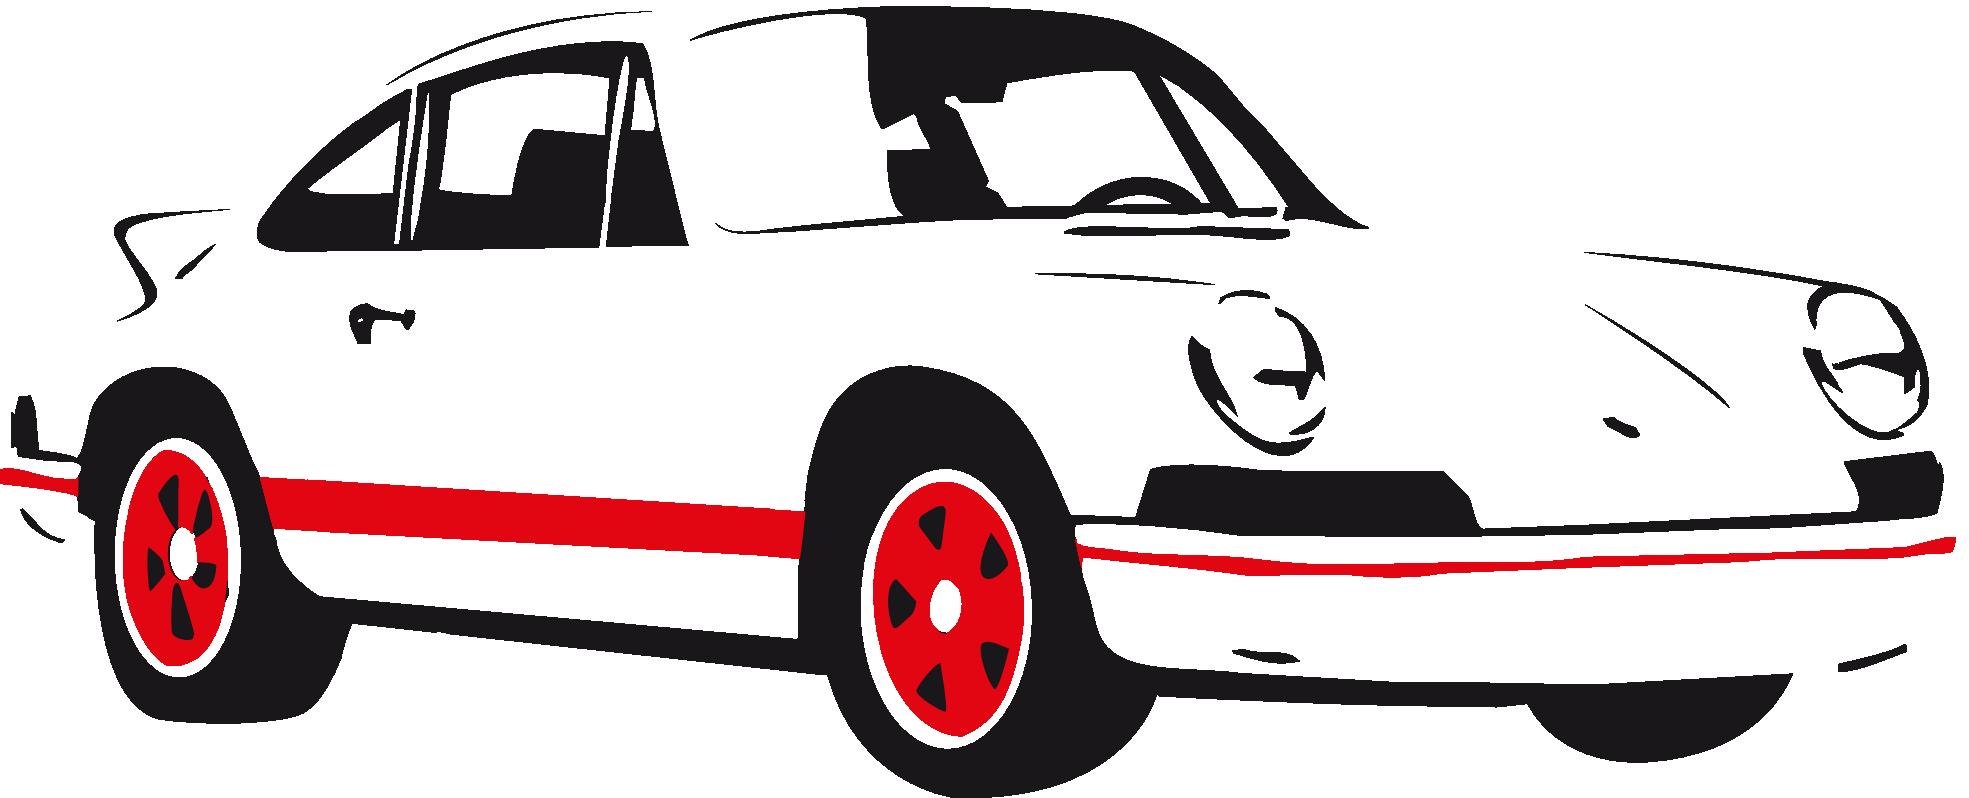 1969x798 Black Sports Car Clipart Clipart Panda